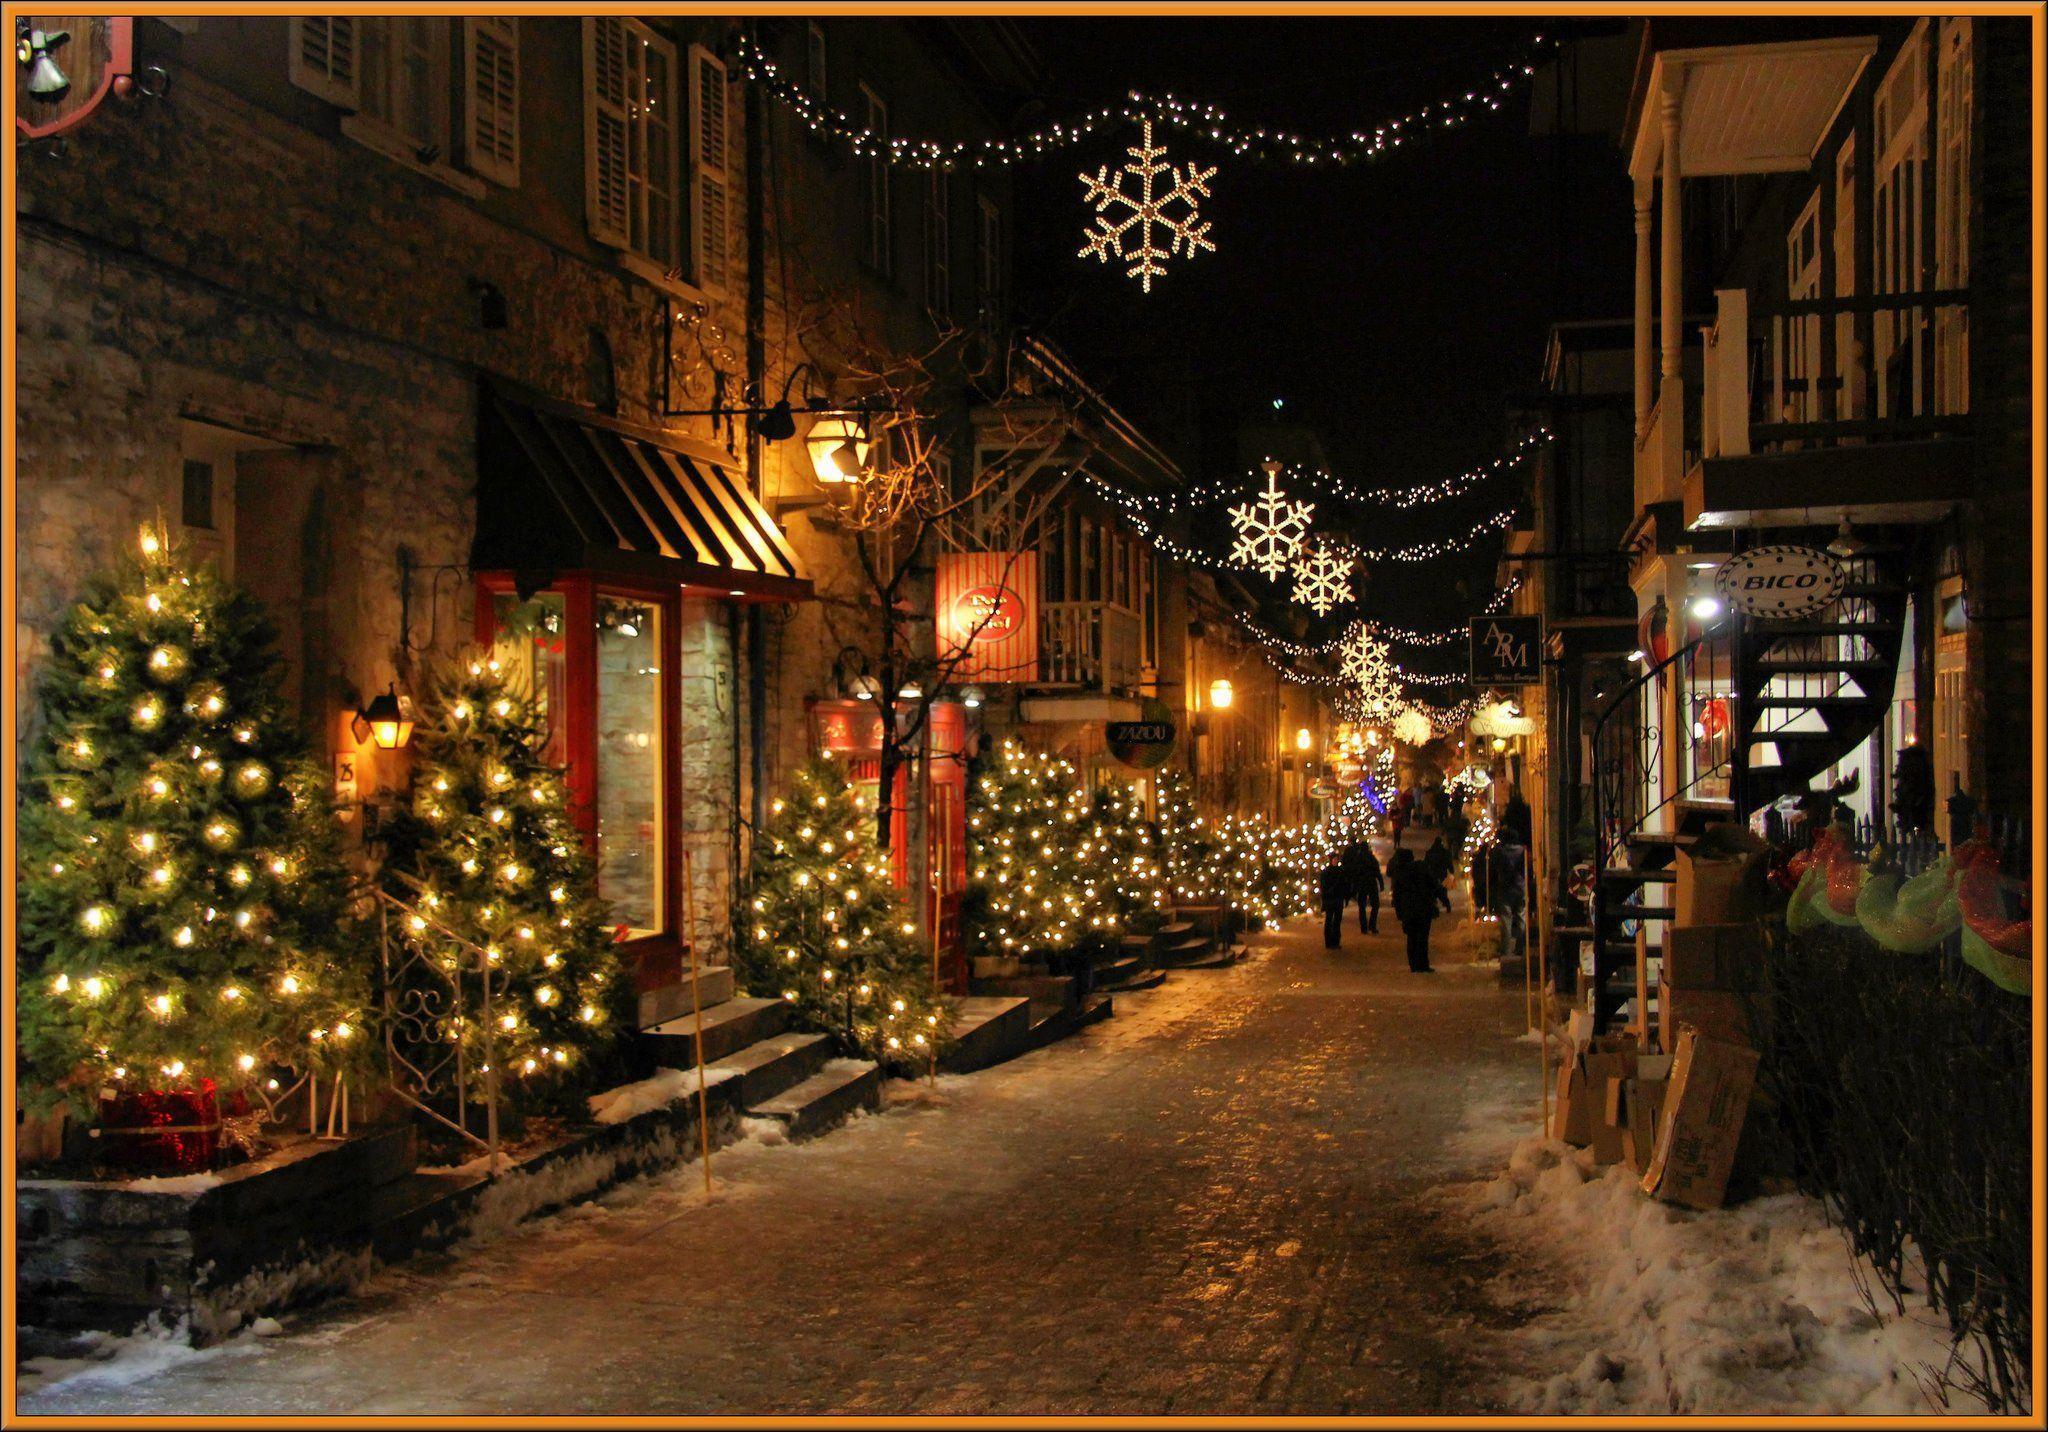 Winter Lights Wallpapers Top Free Winter Lights Backgrounds Wallpaperaccess